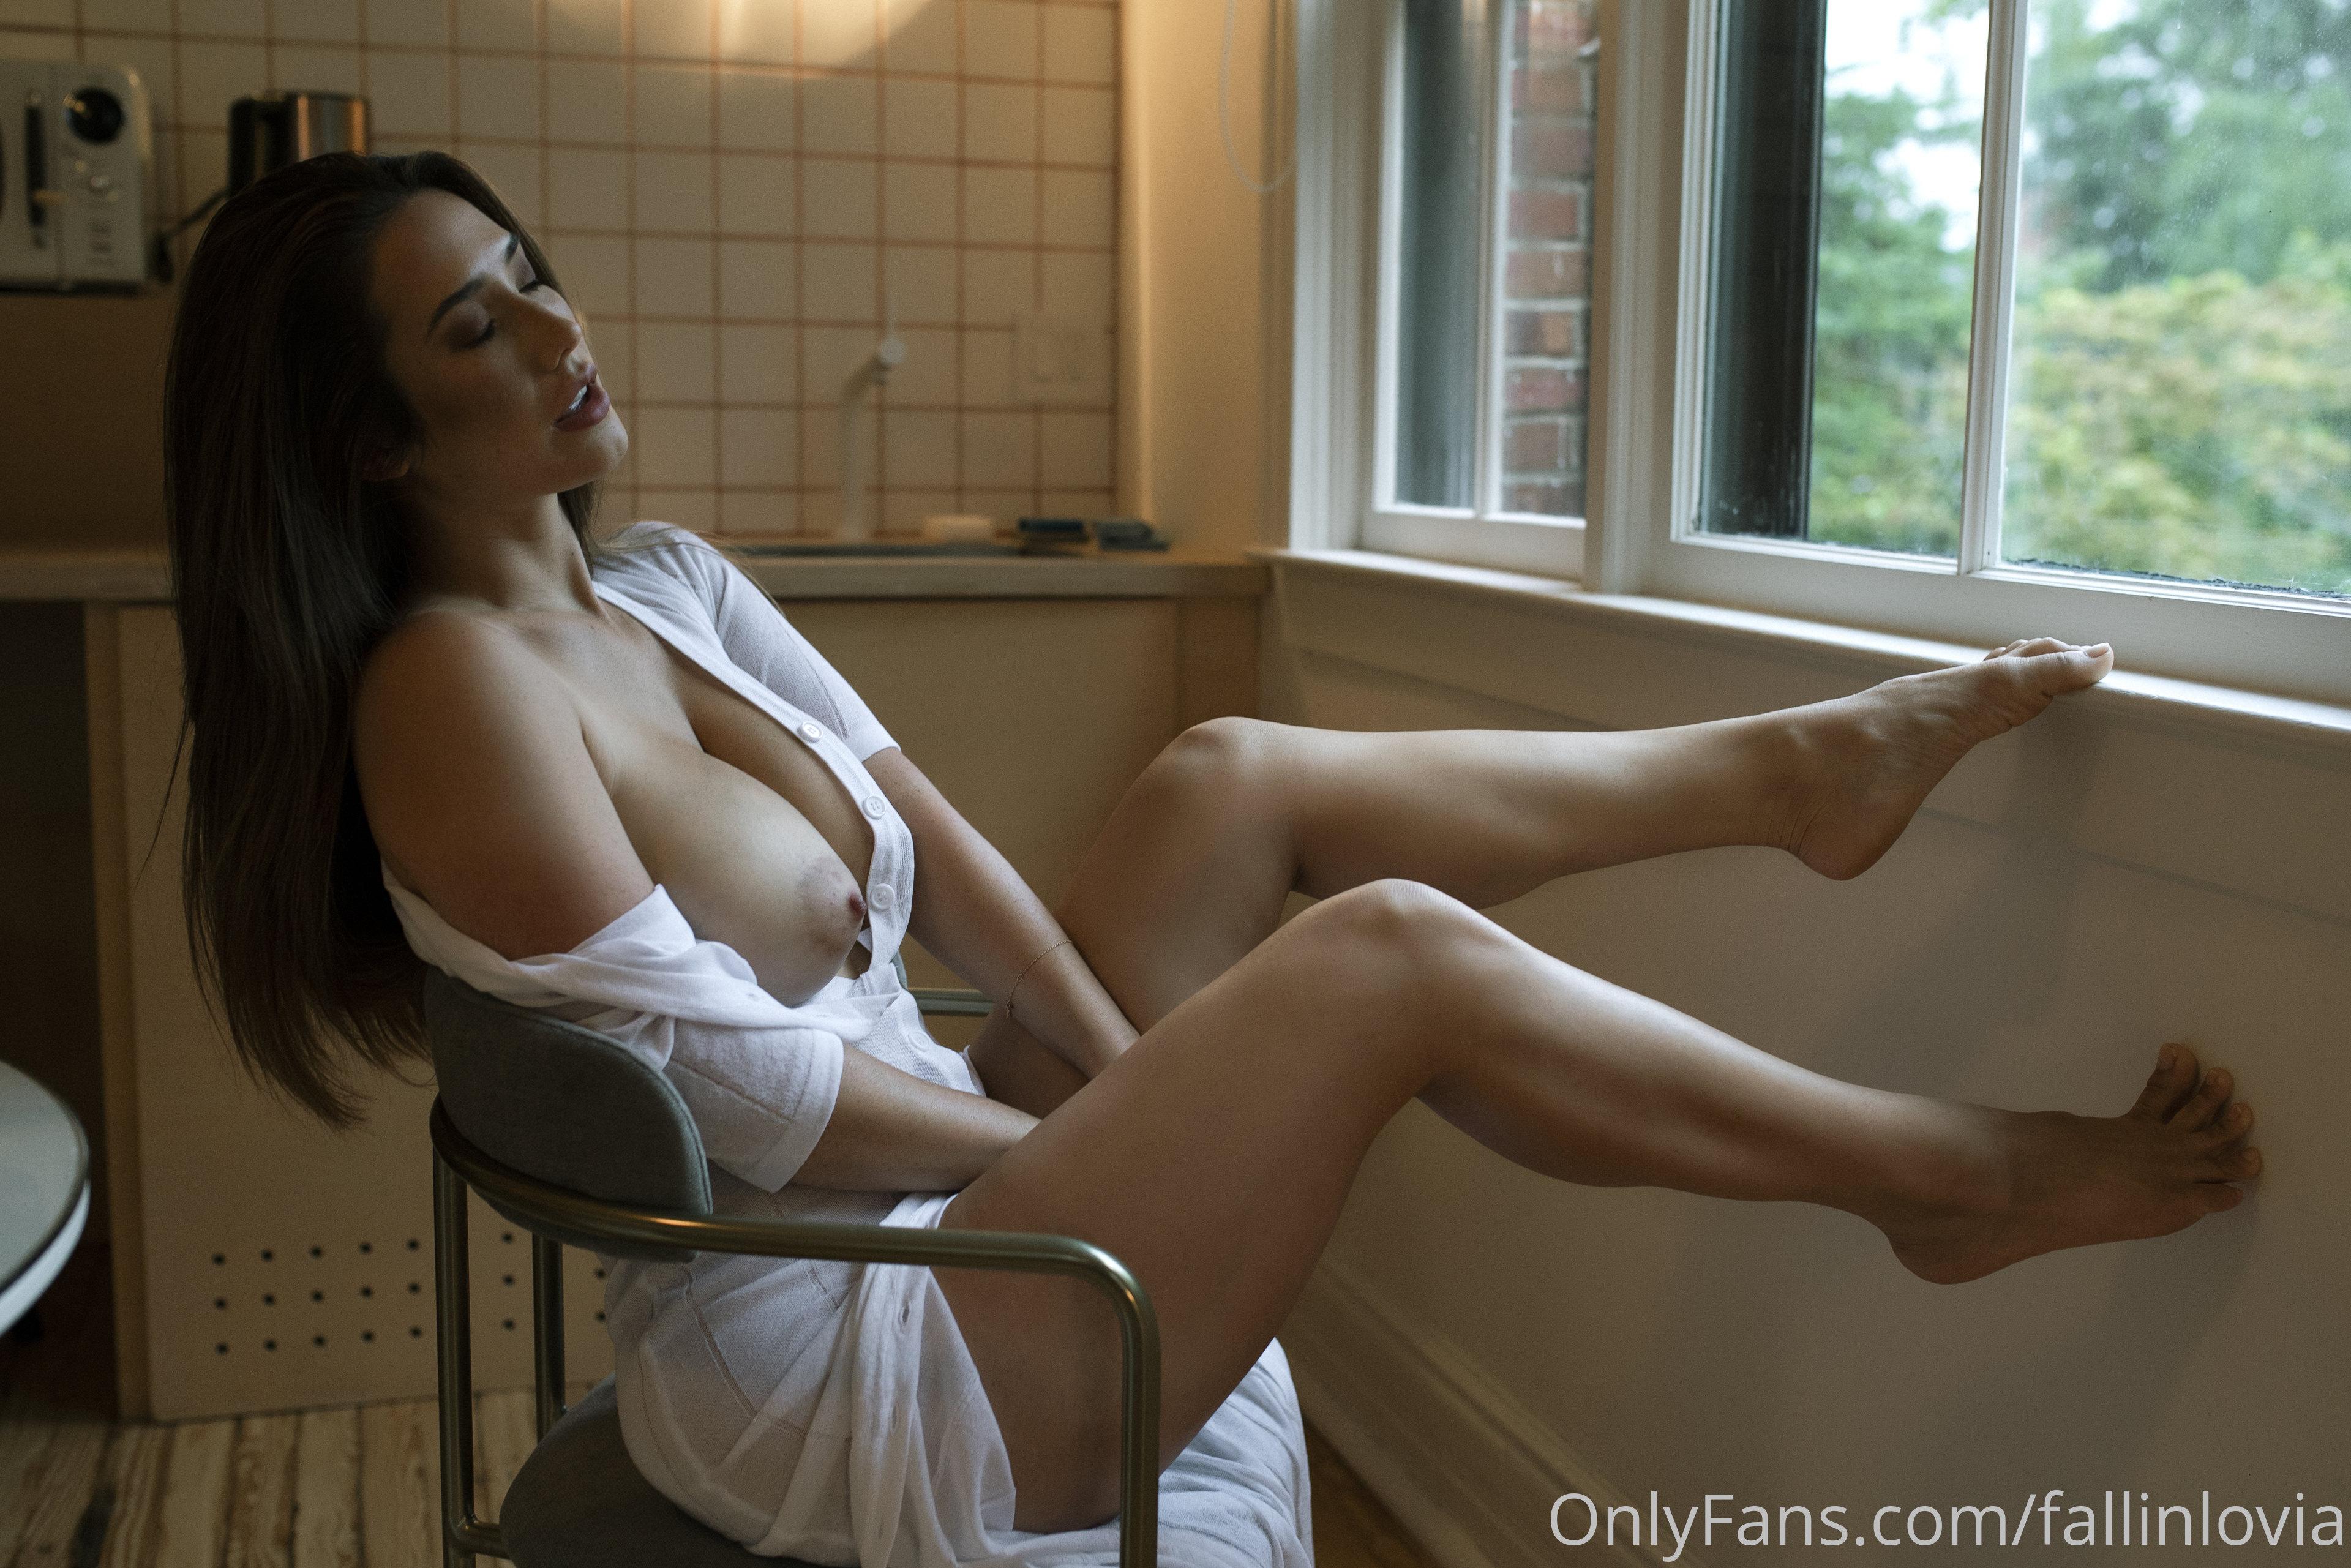 Eva Lovia, Fallinlovia, Onlyfans 0295